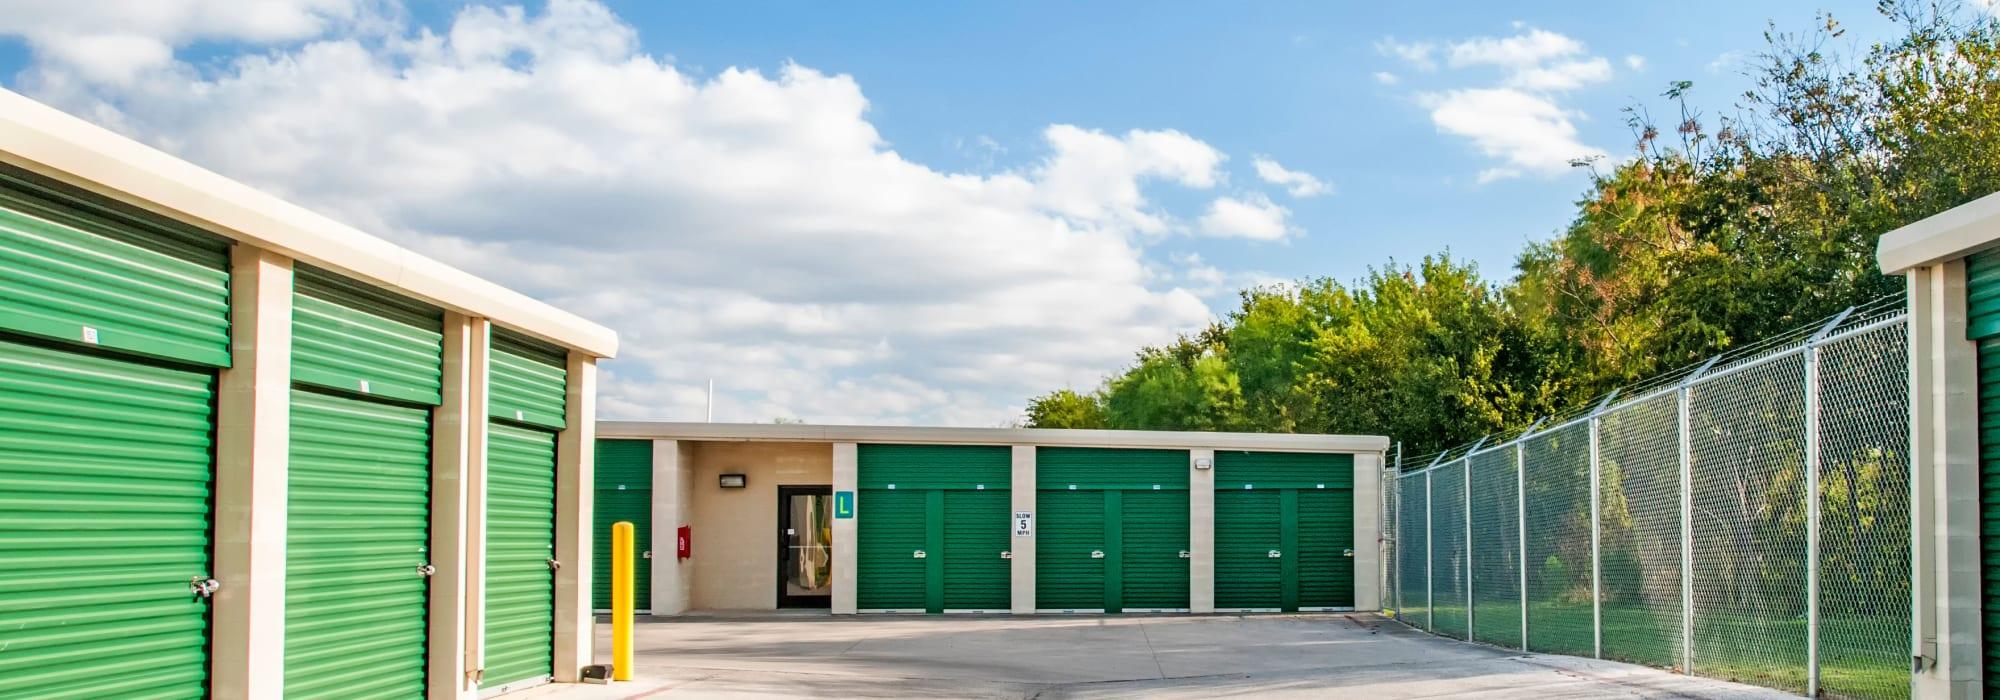 Outdoor storage units with green doors at Lockaway Storage in San Antonio, Texas